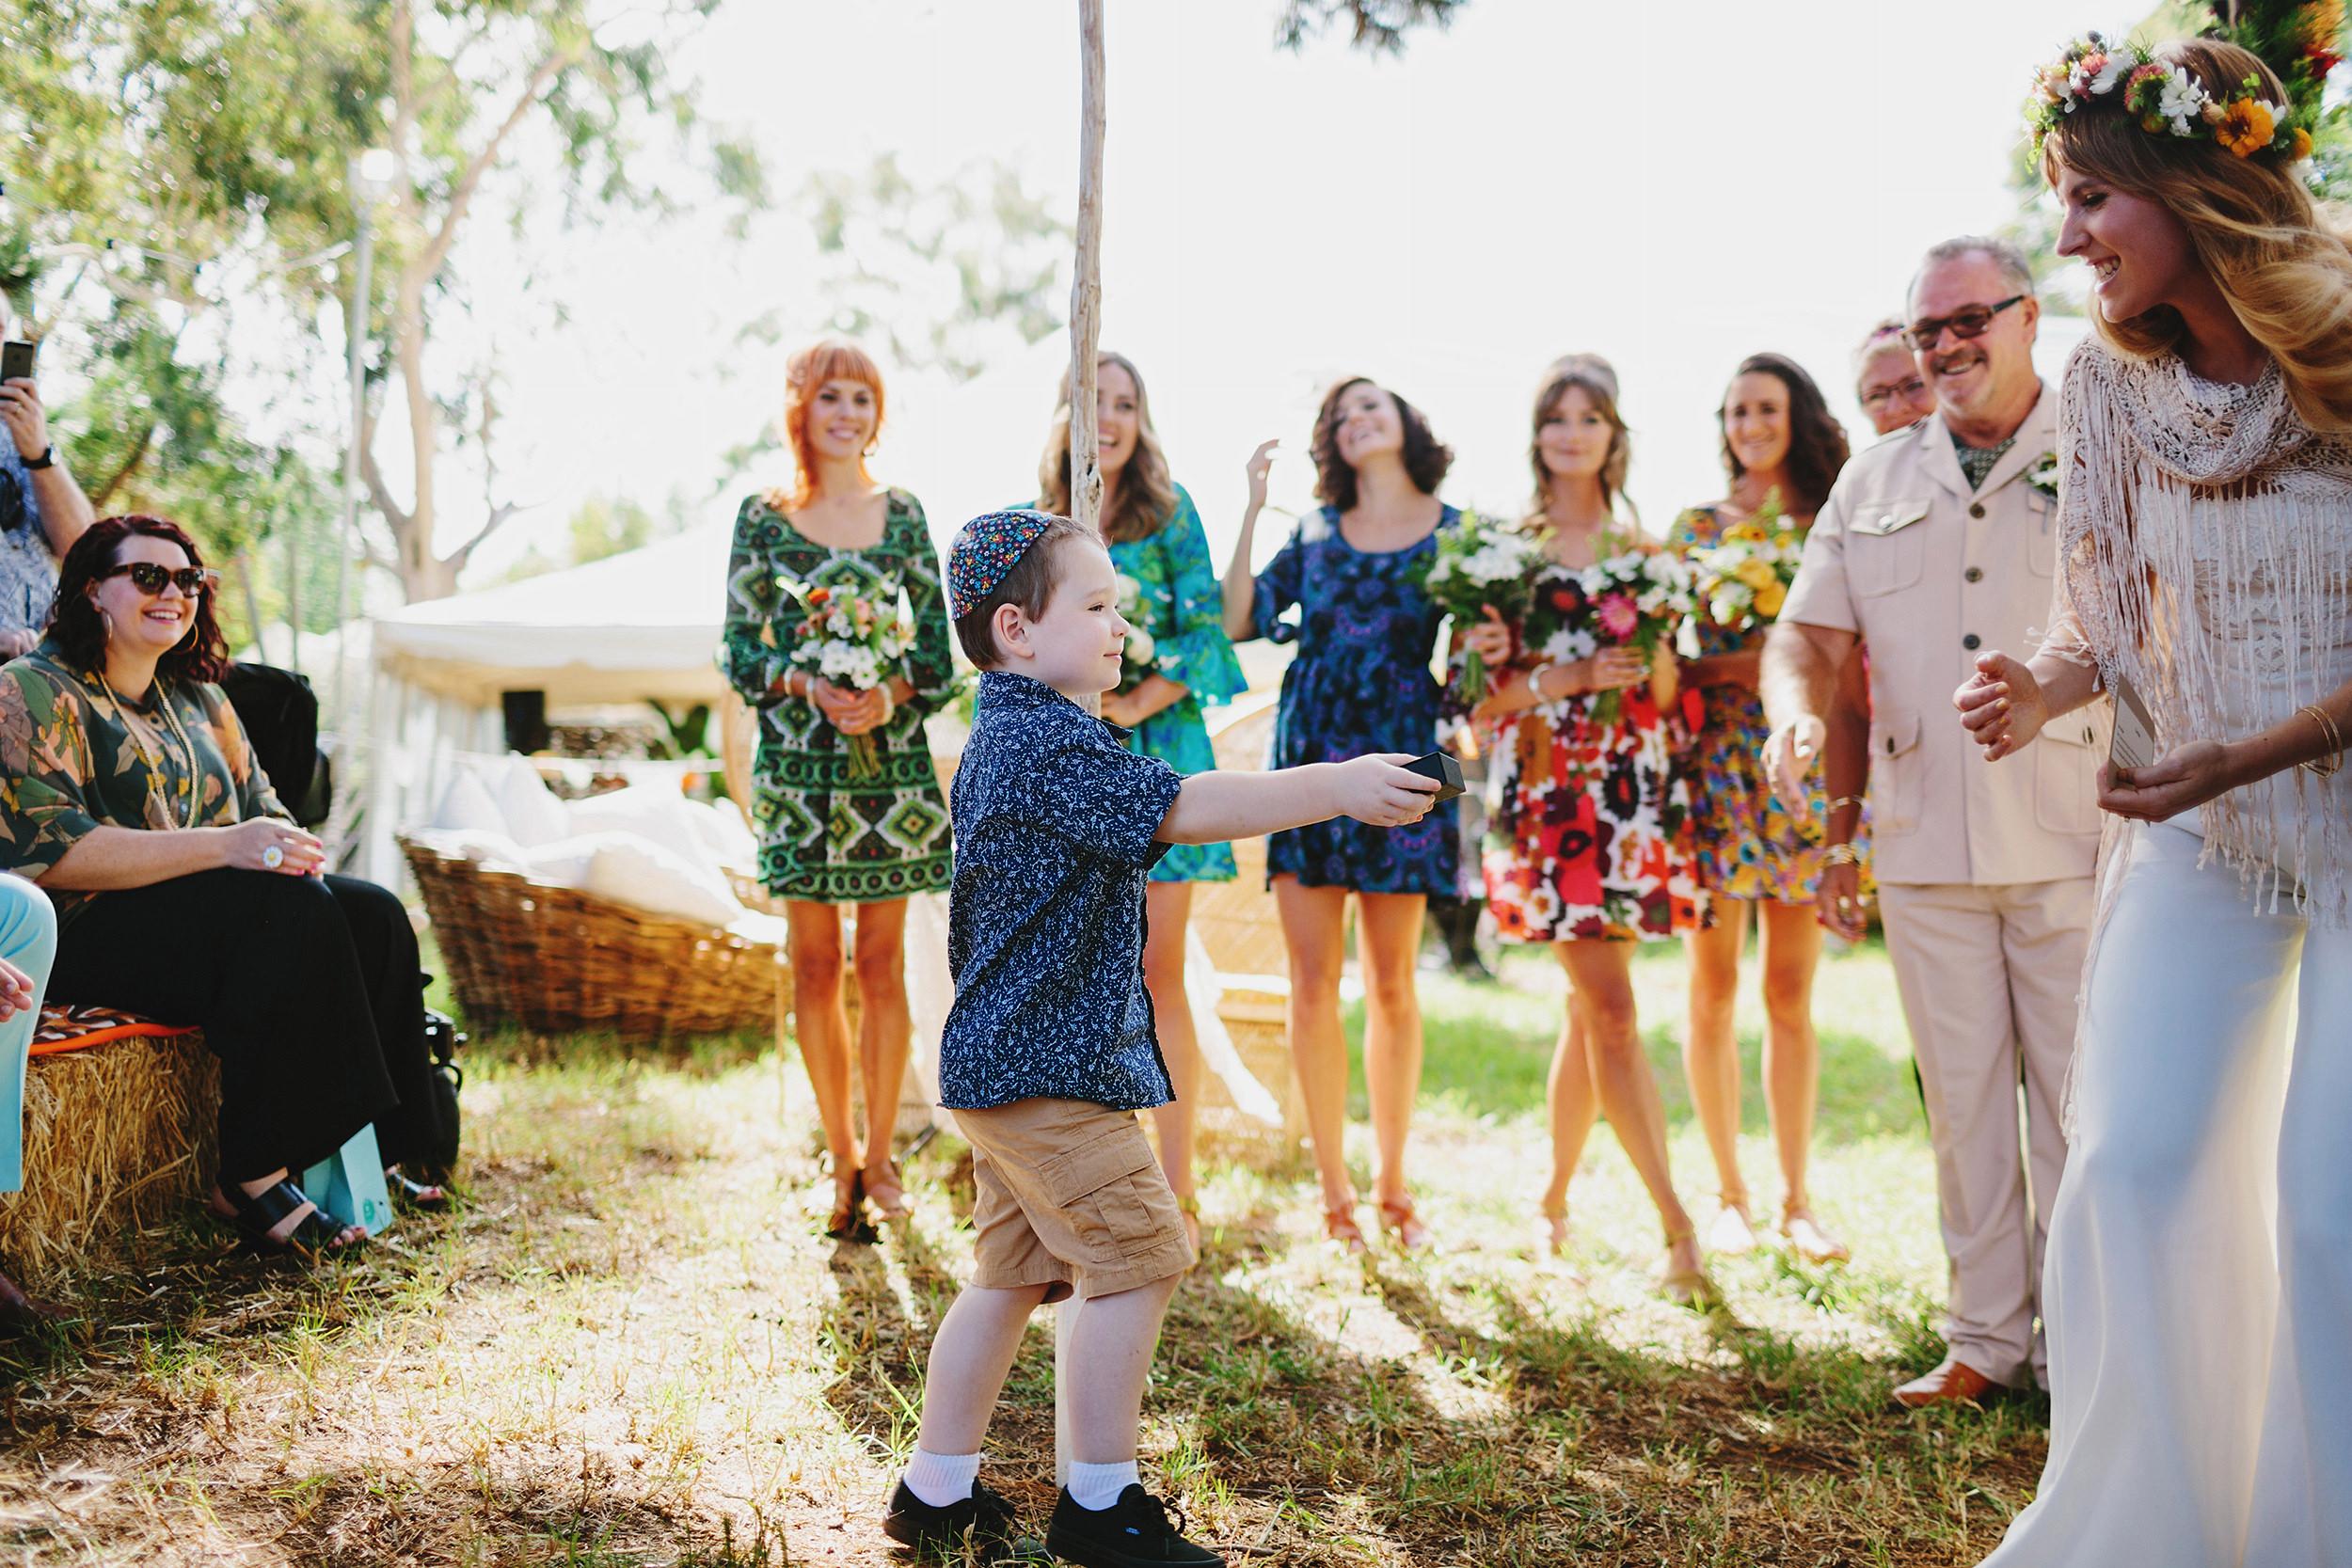 Melbourne_Vintage_Backyard_Wedding_Ben_Erin 031.JPG